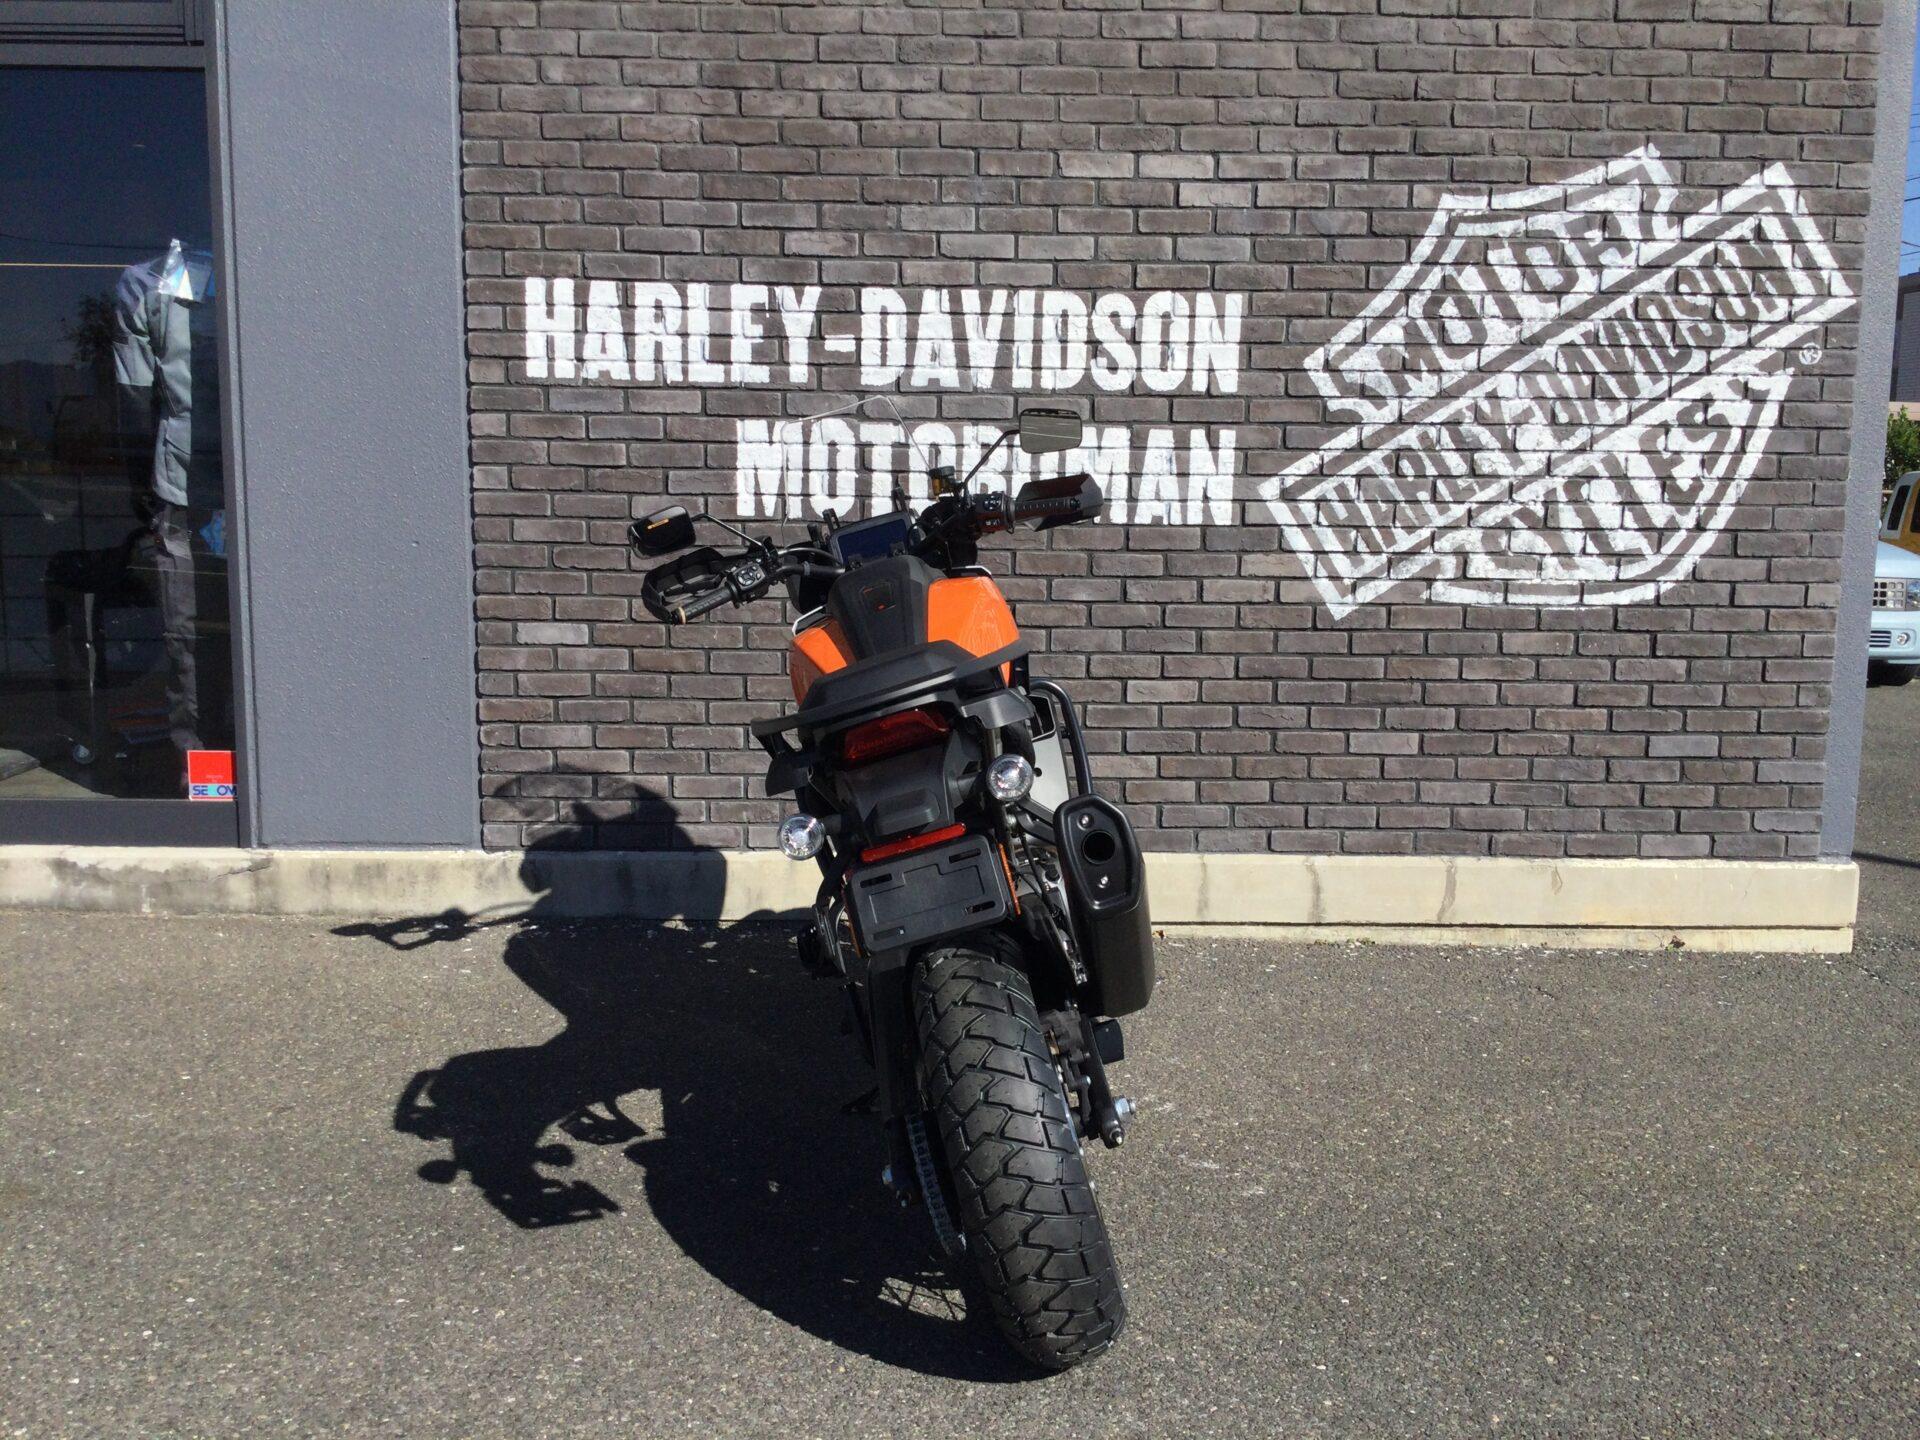 HARLEY DAVIDSON RA1250S